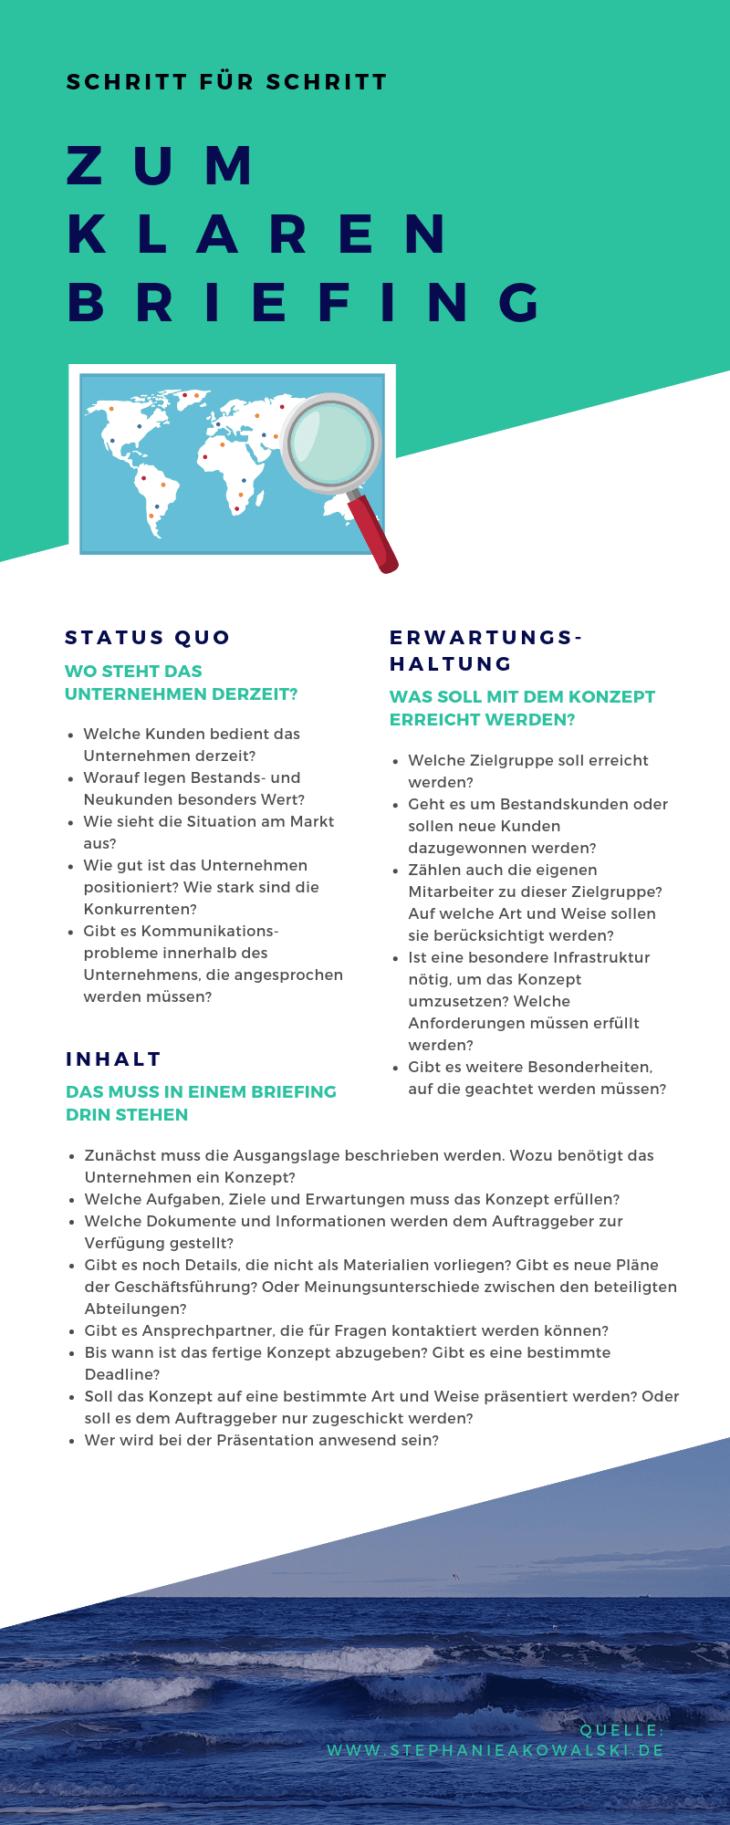 Micro Content Beispiel: Infografik